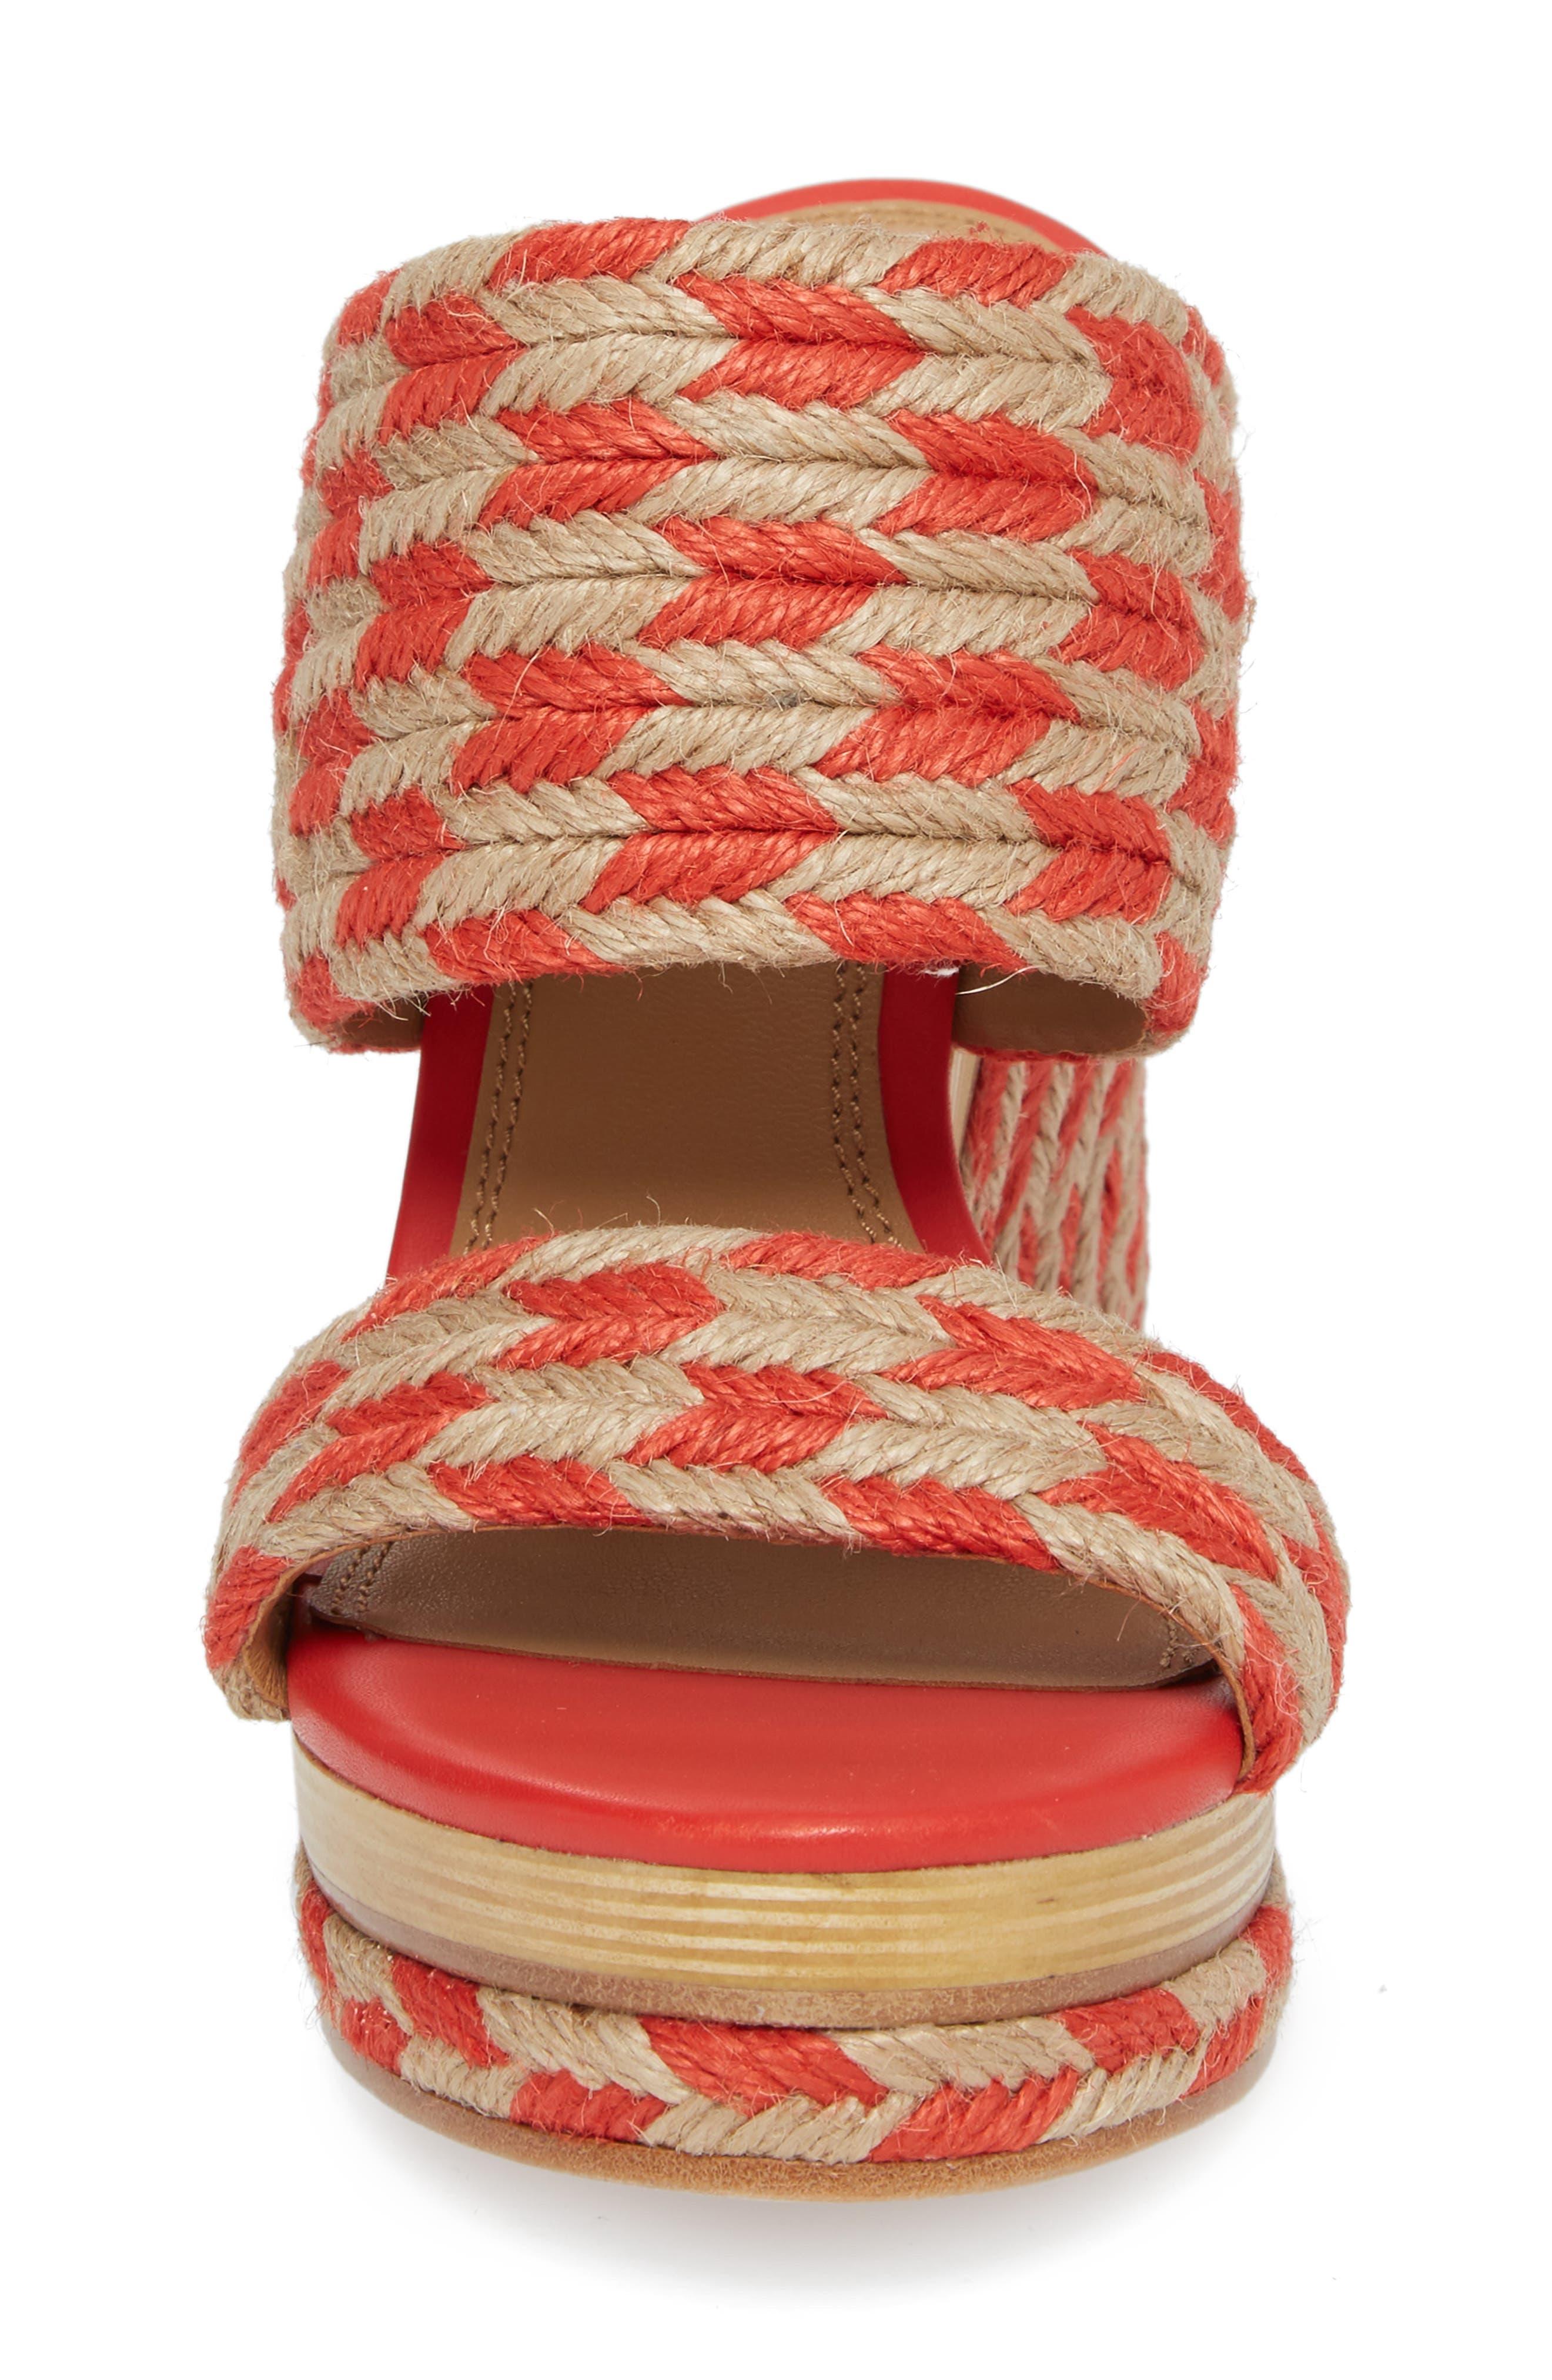 Lola Woven Platform Sandal,                             Alternate thumbnail 5, color,                             Poppy Orange/ Perfect Ivory